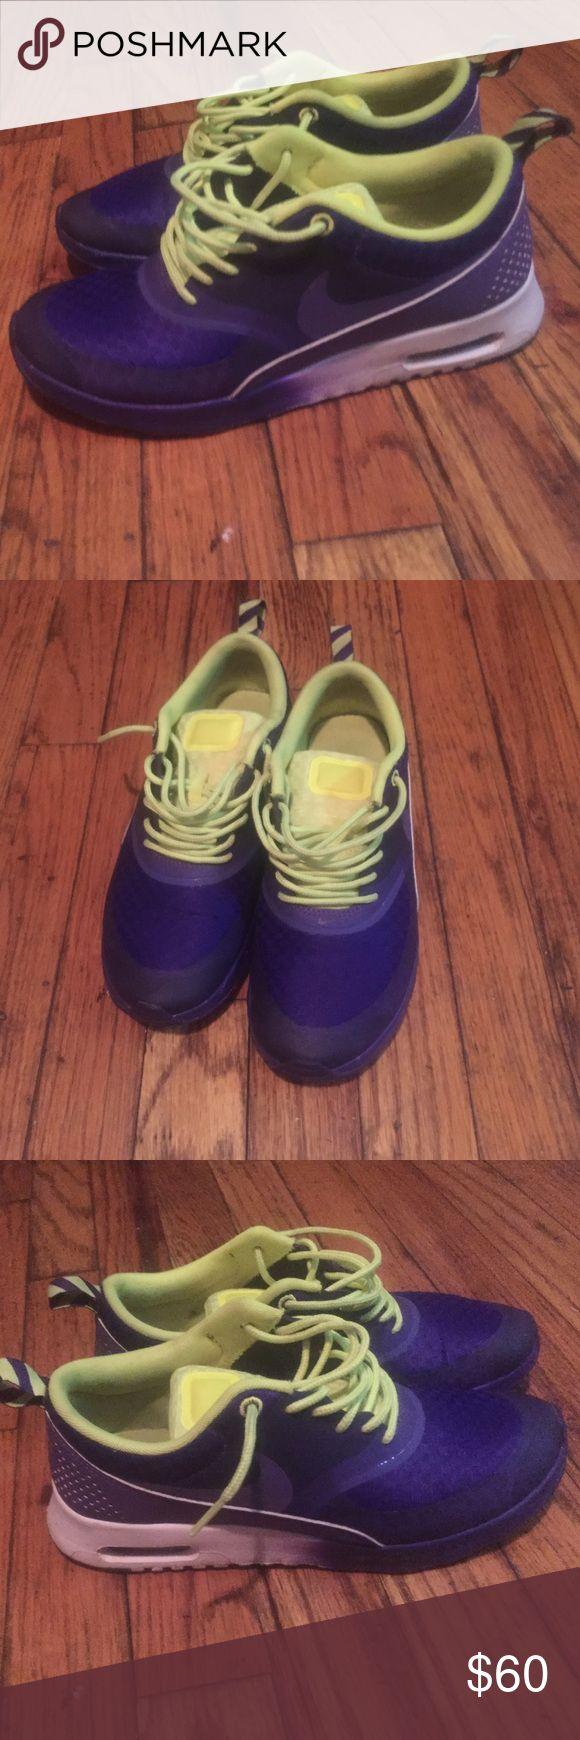 Women sneakers Nike air max Thea purple and neon Nike Shoes Sneakers